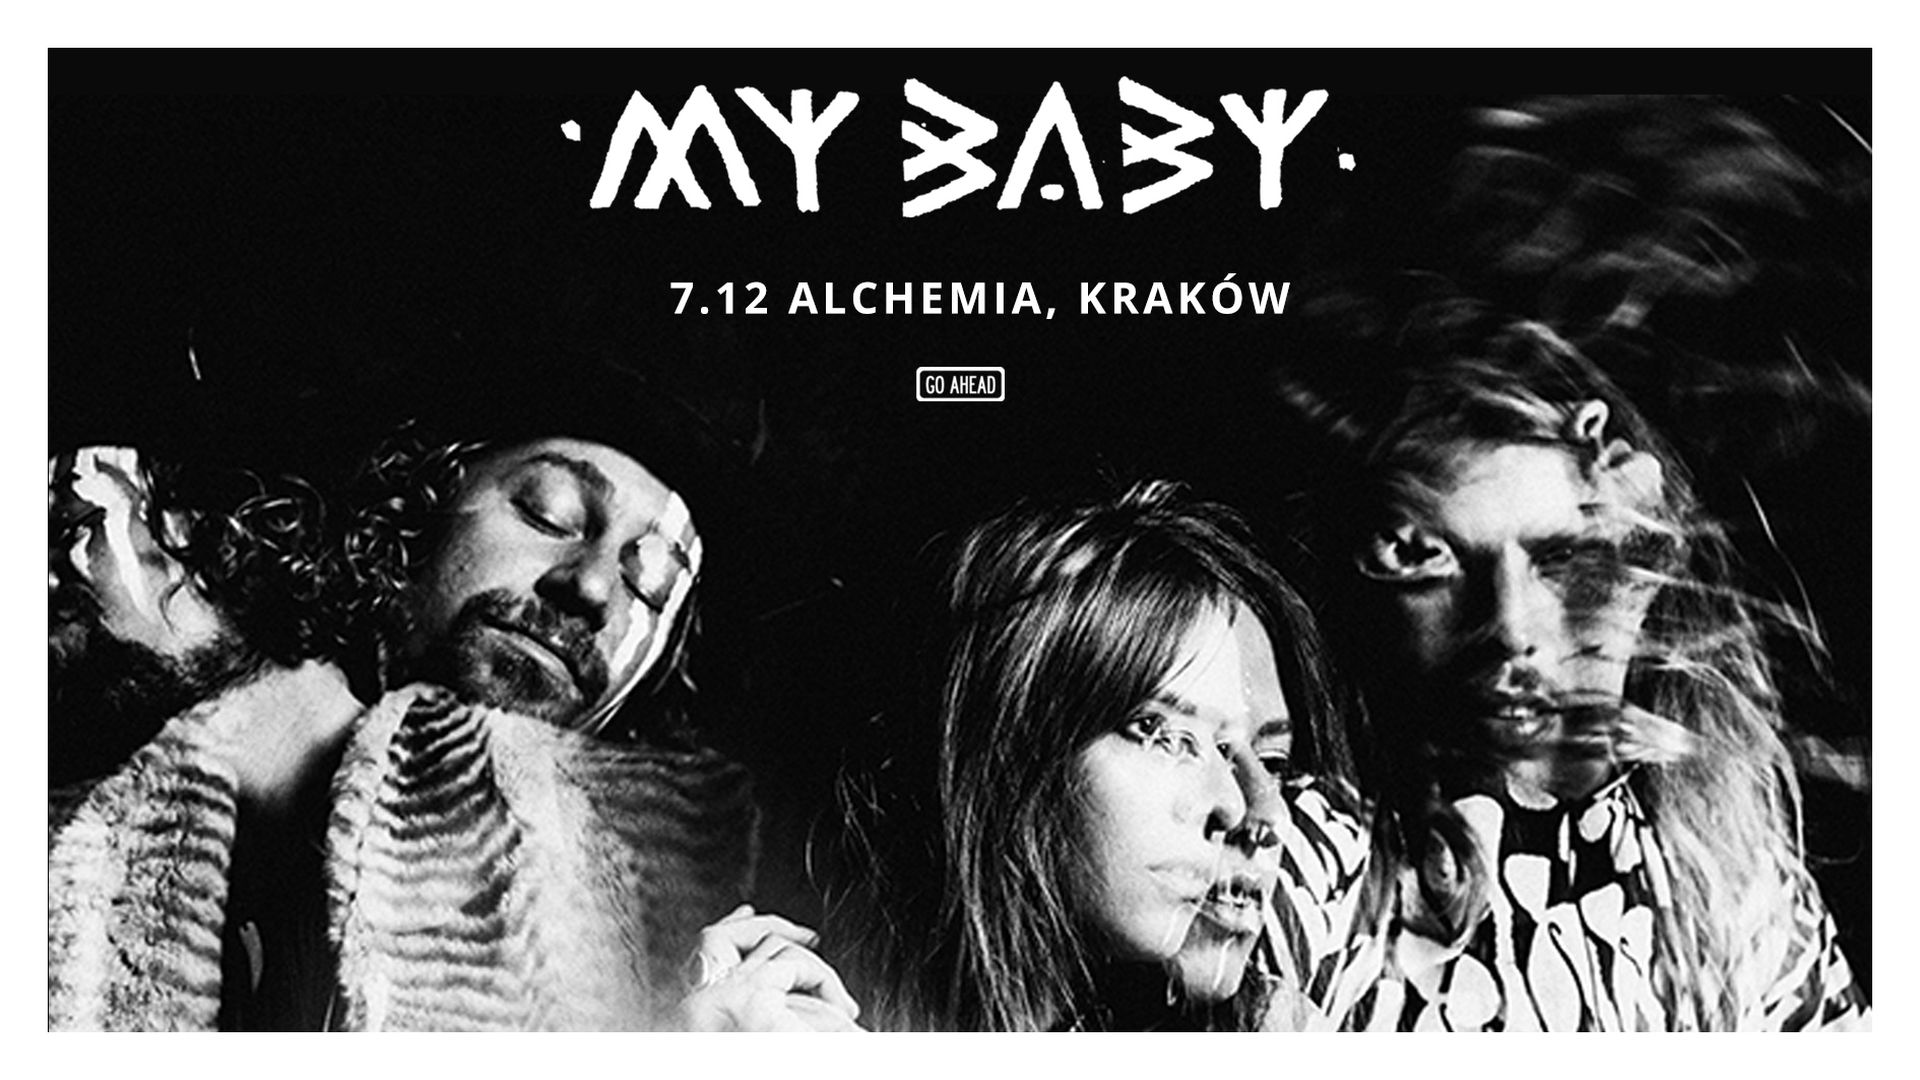 Bilety kolekcjonerskie - MY BABY